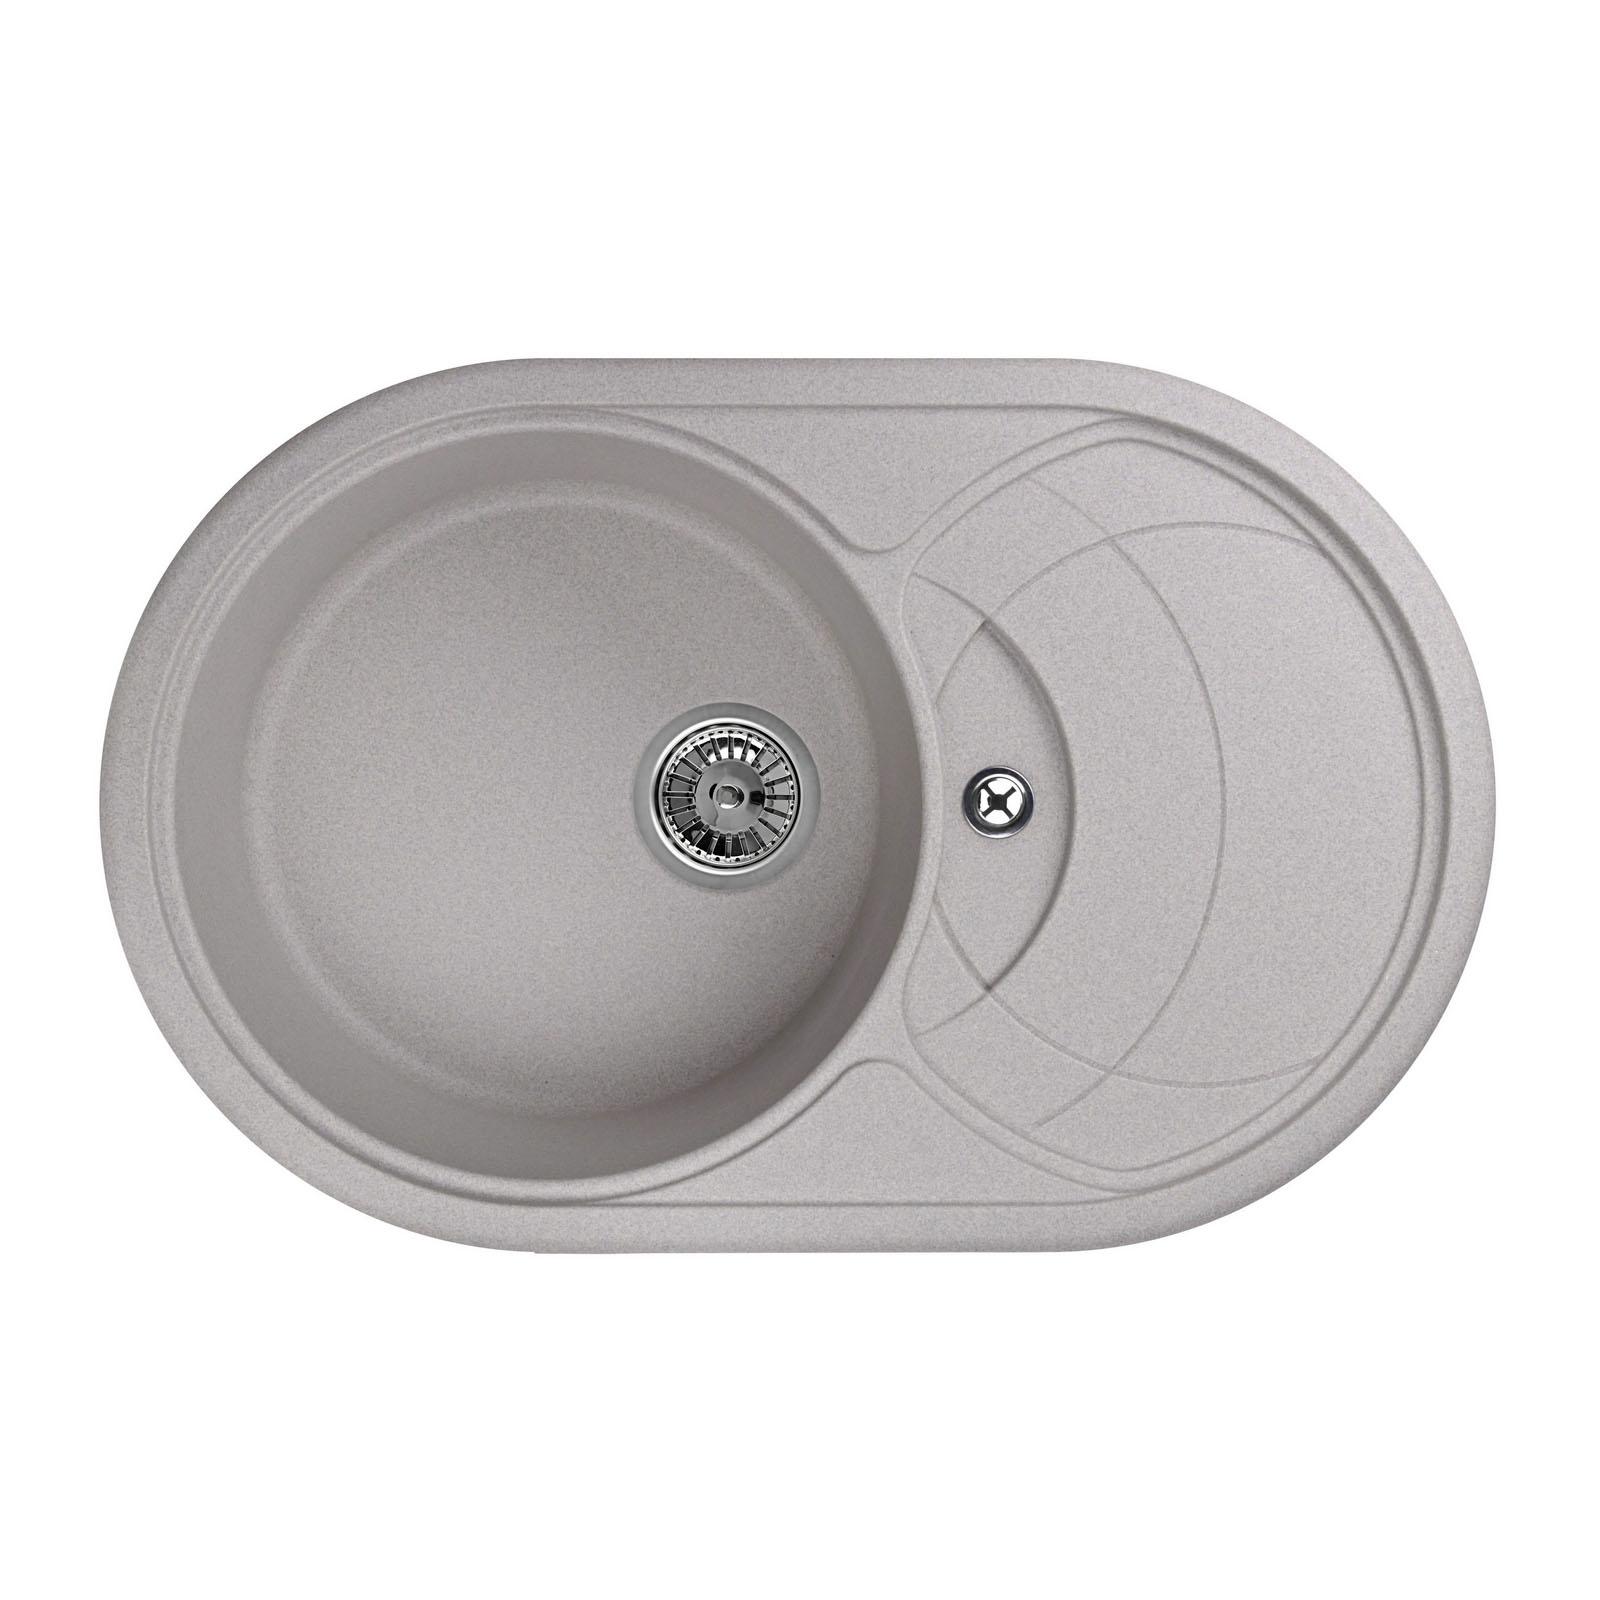 Кухонная мойка Granula GR-7801 775х495 антик цена